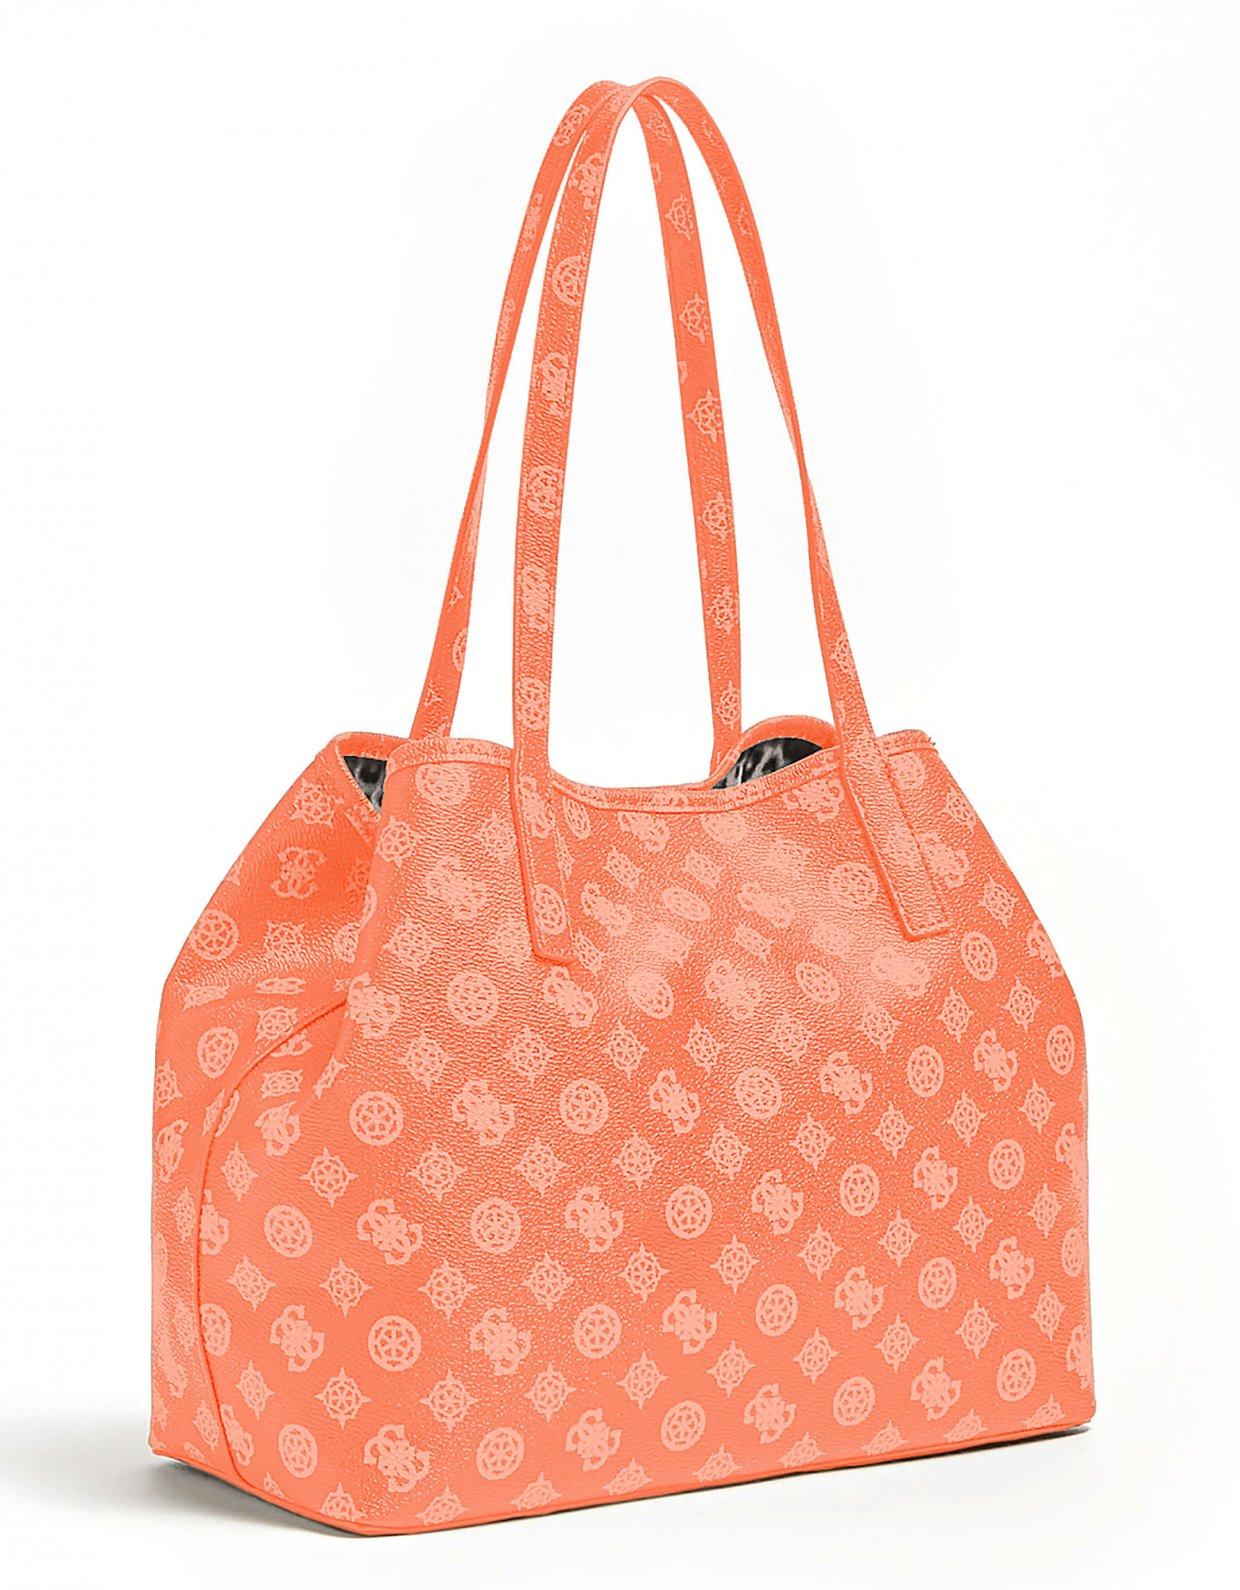 GUESS Vikky large tote bag coral